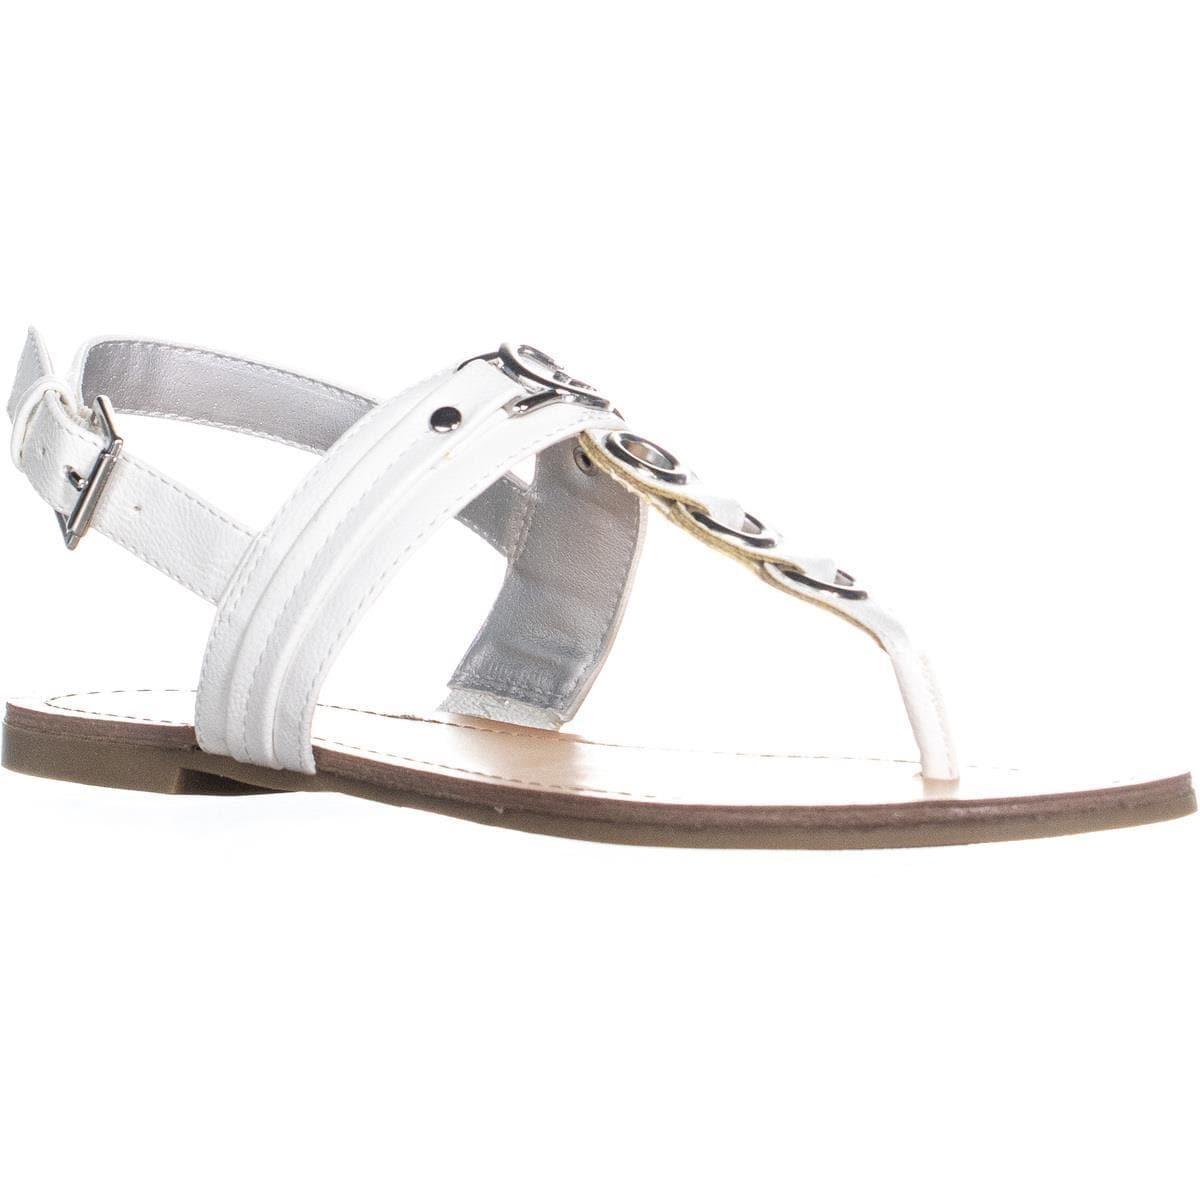 7adb2c5fc8a Shop G by Guess Lesha Buckle Thong Sandals